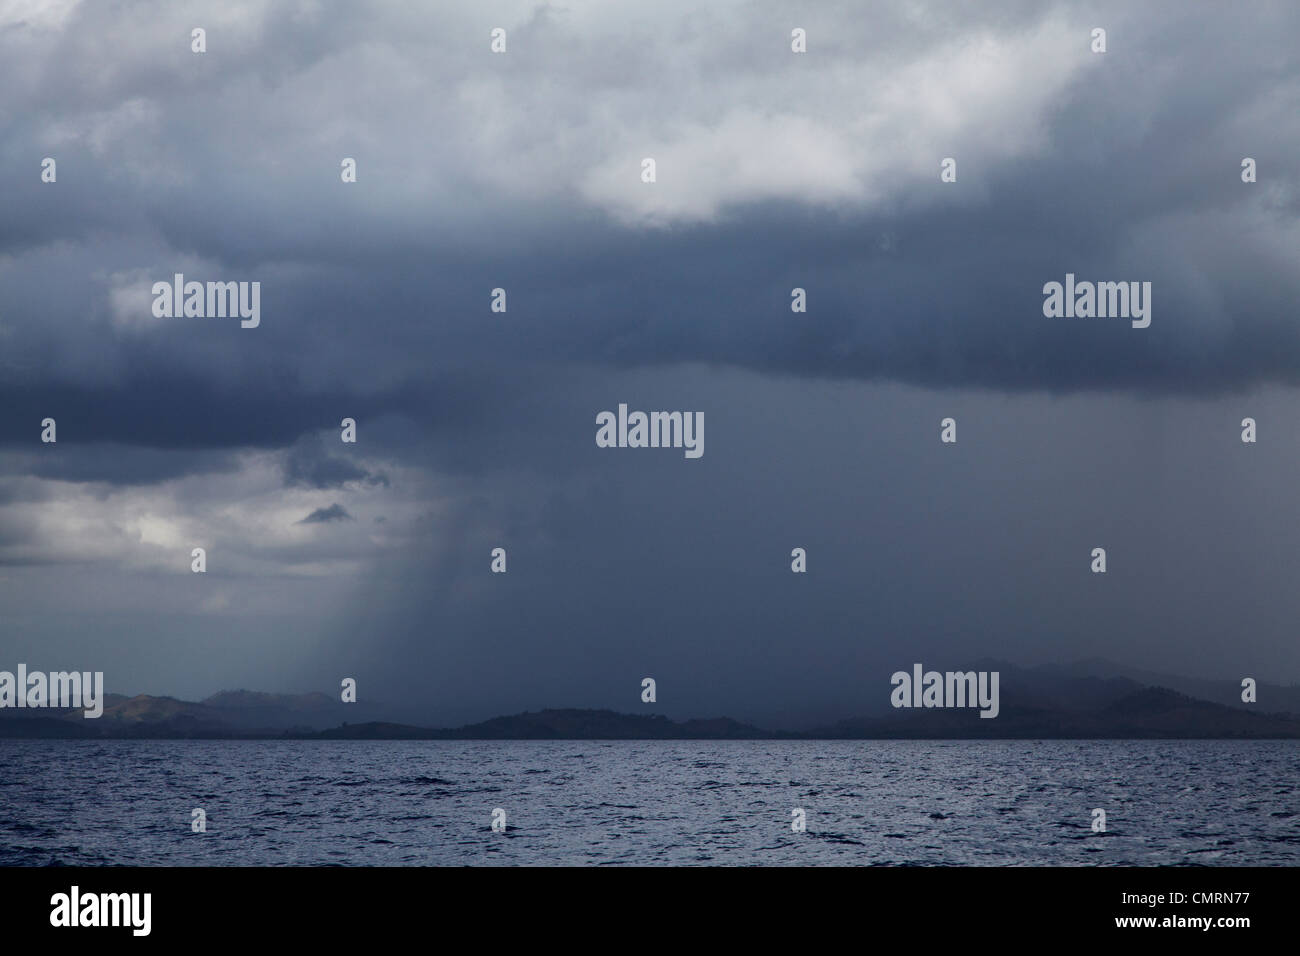 Tropical Rain Storm Stock Photos & Tropical Rain Storm Stock